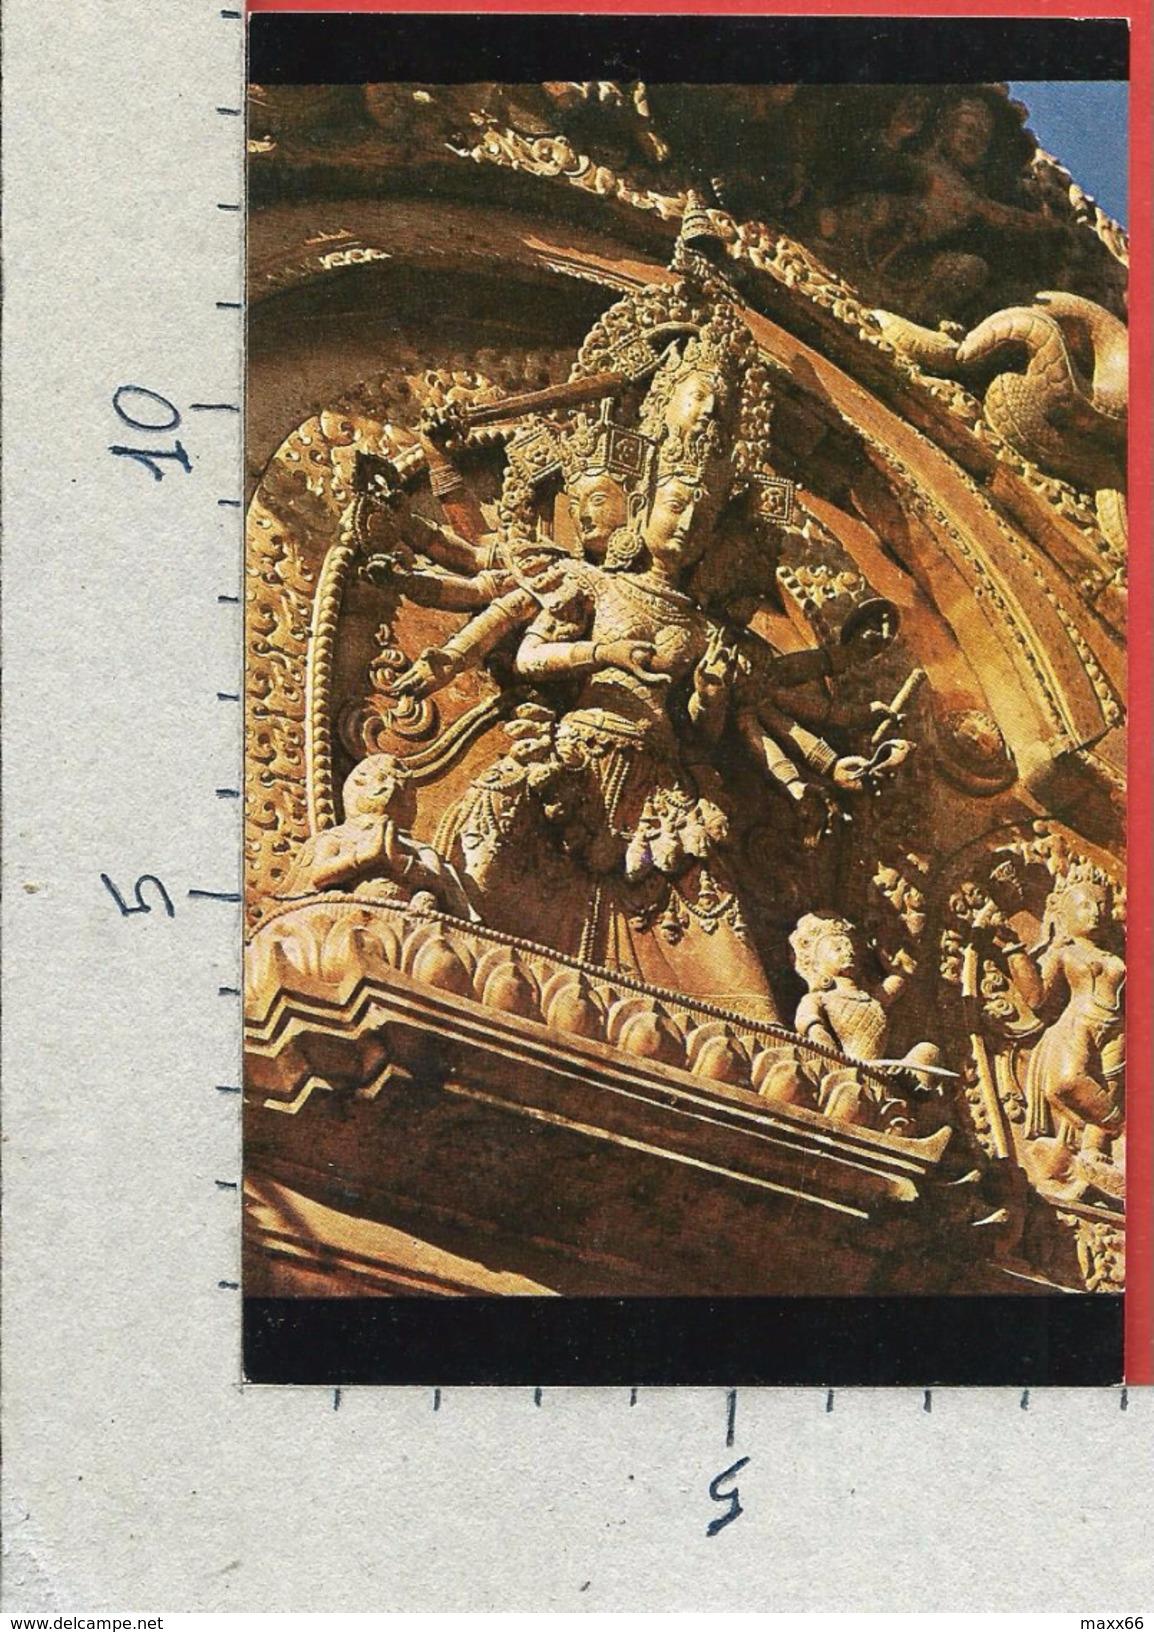 CARTOLINA NV NEPAL - BHAGABATI Goddes & Power - Golden Gate Of Bhadgaon - 9 X 14 - Nepal